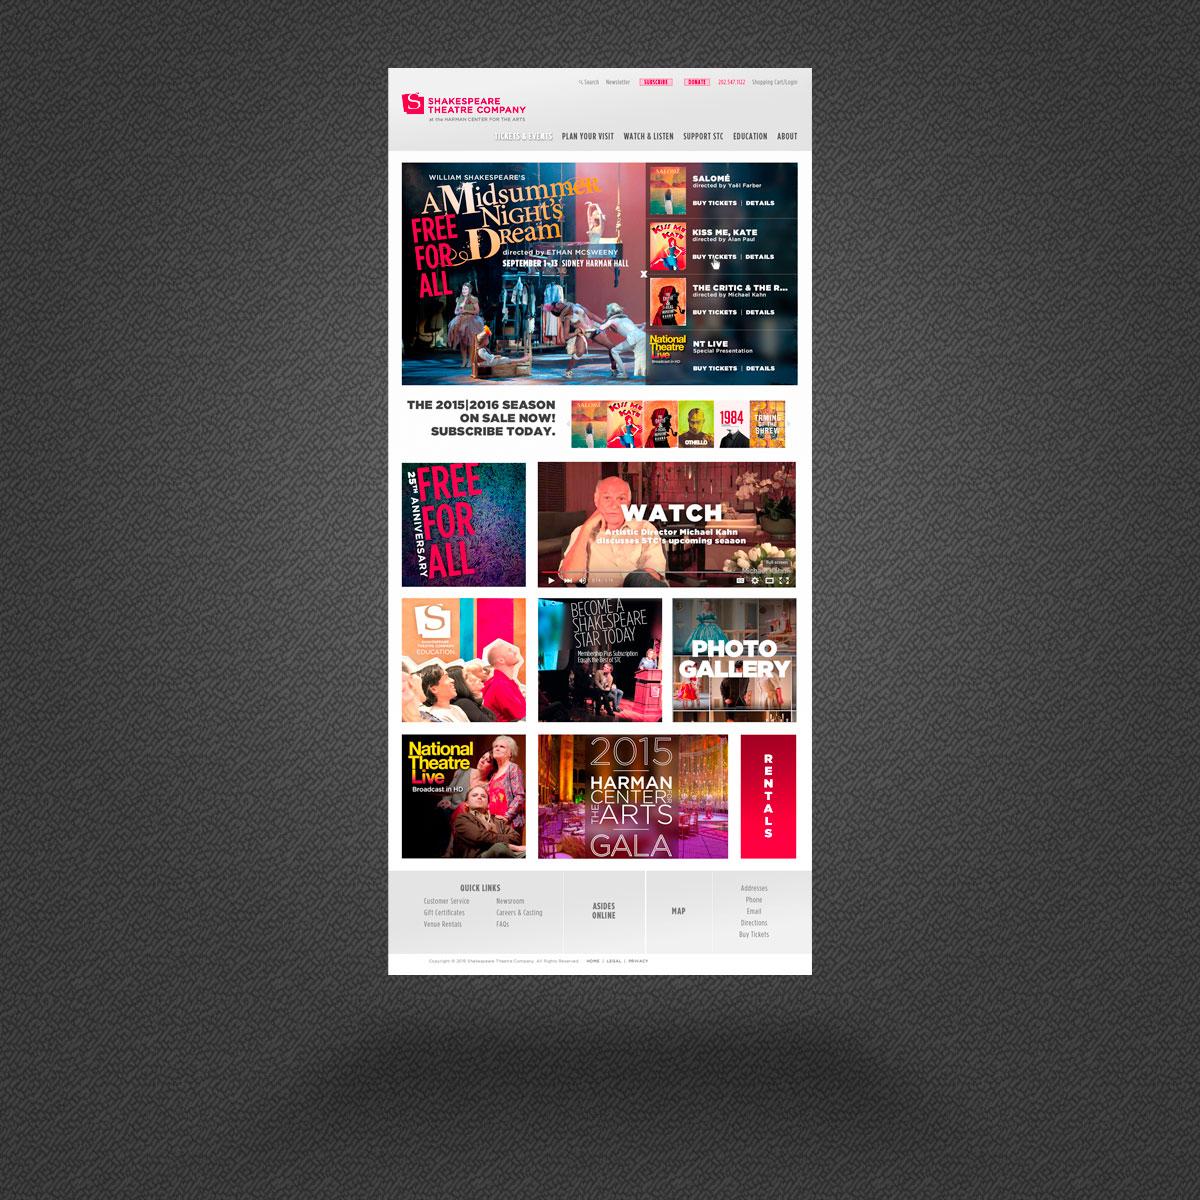 Website Redesign—shakespearetheatre.org